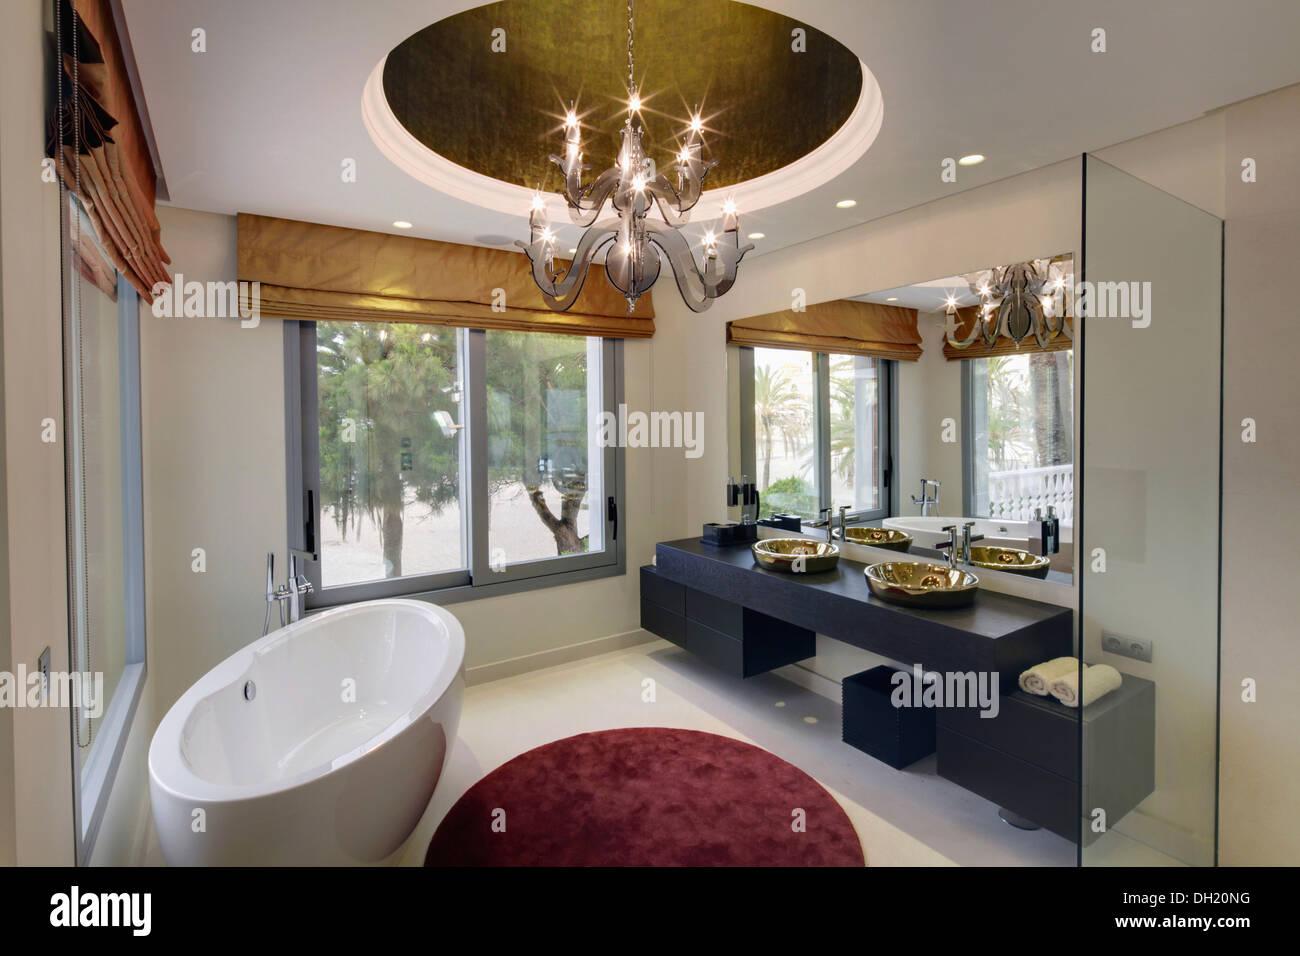 Oval freestanding bath and circular rug in modern Spanish bathroom ...